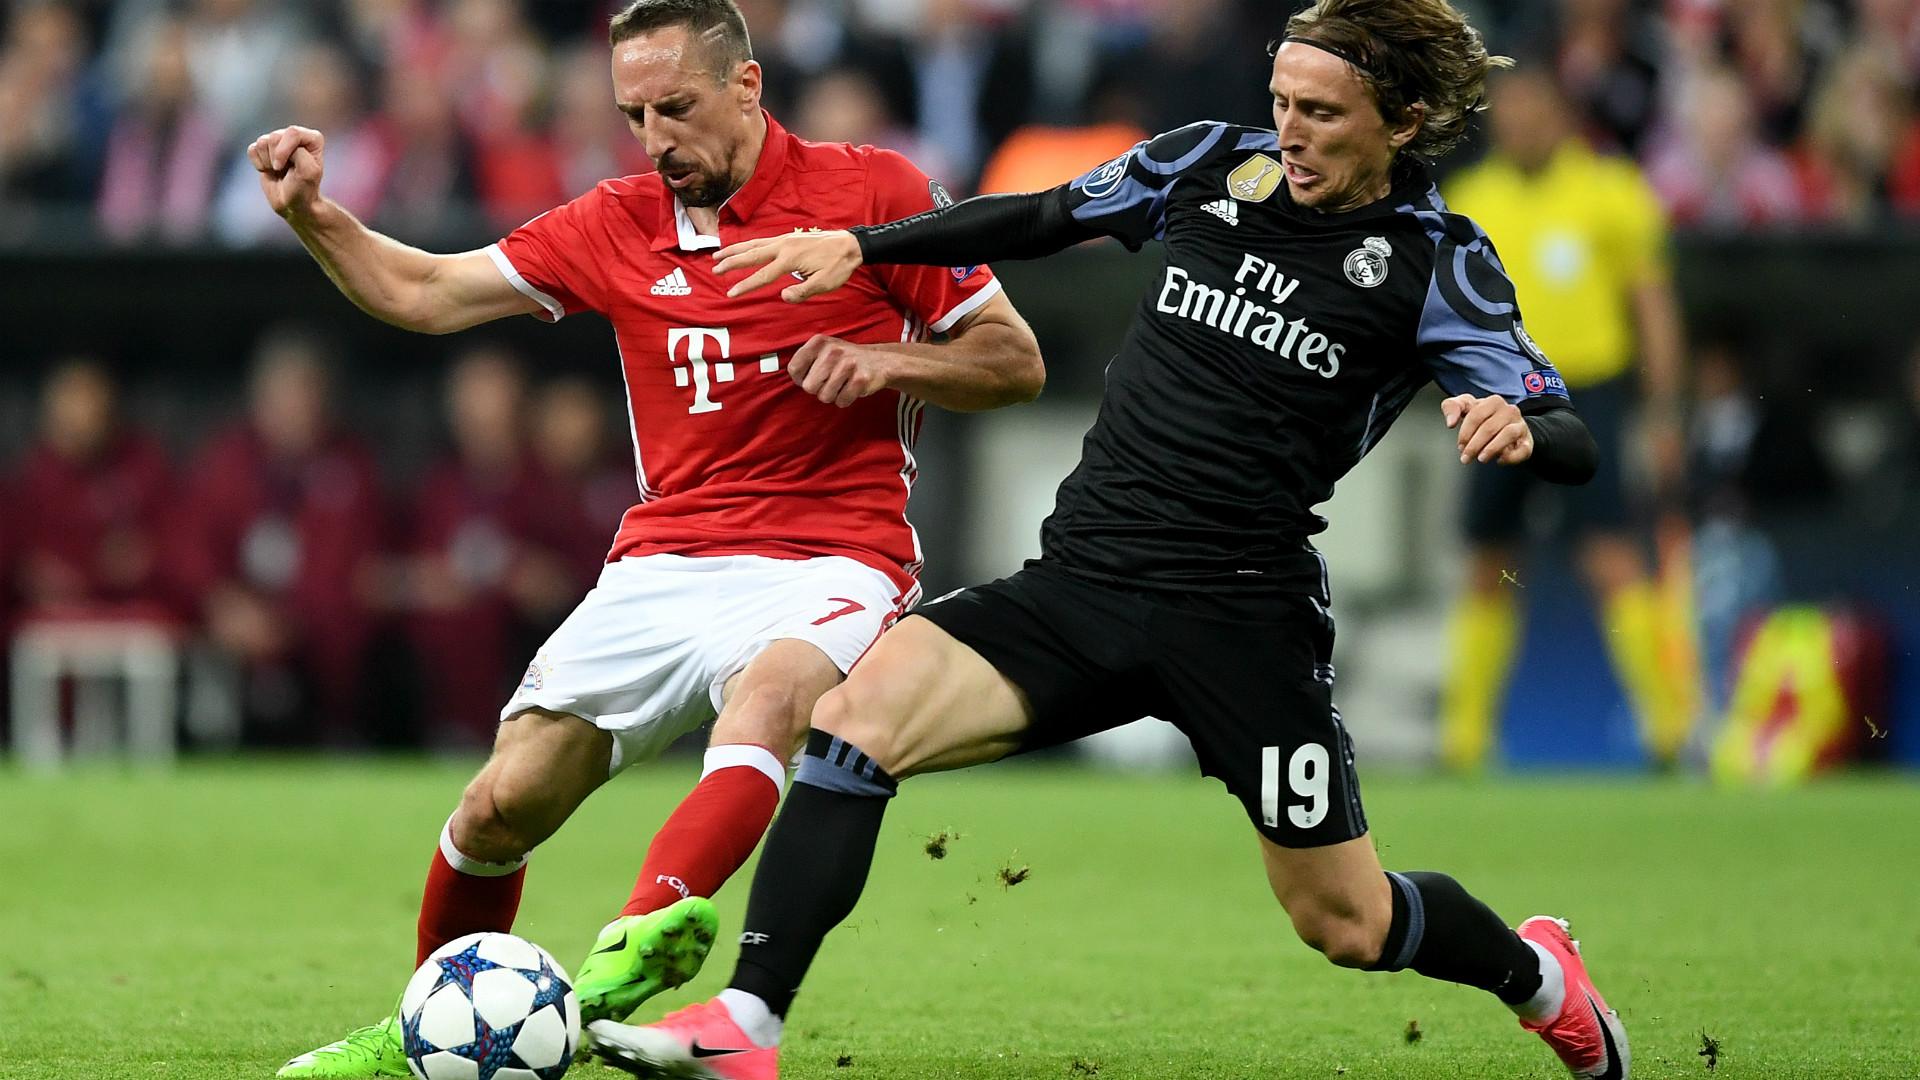 FRANCK RIBERY BAYERN MÜNCHEN LUKA MODRIC REAL MADRID UEFA CHAMPIONS LEAGUE 12042017